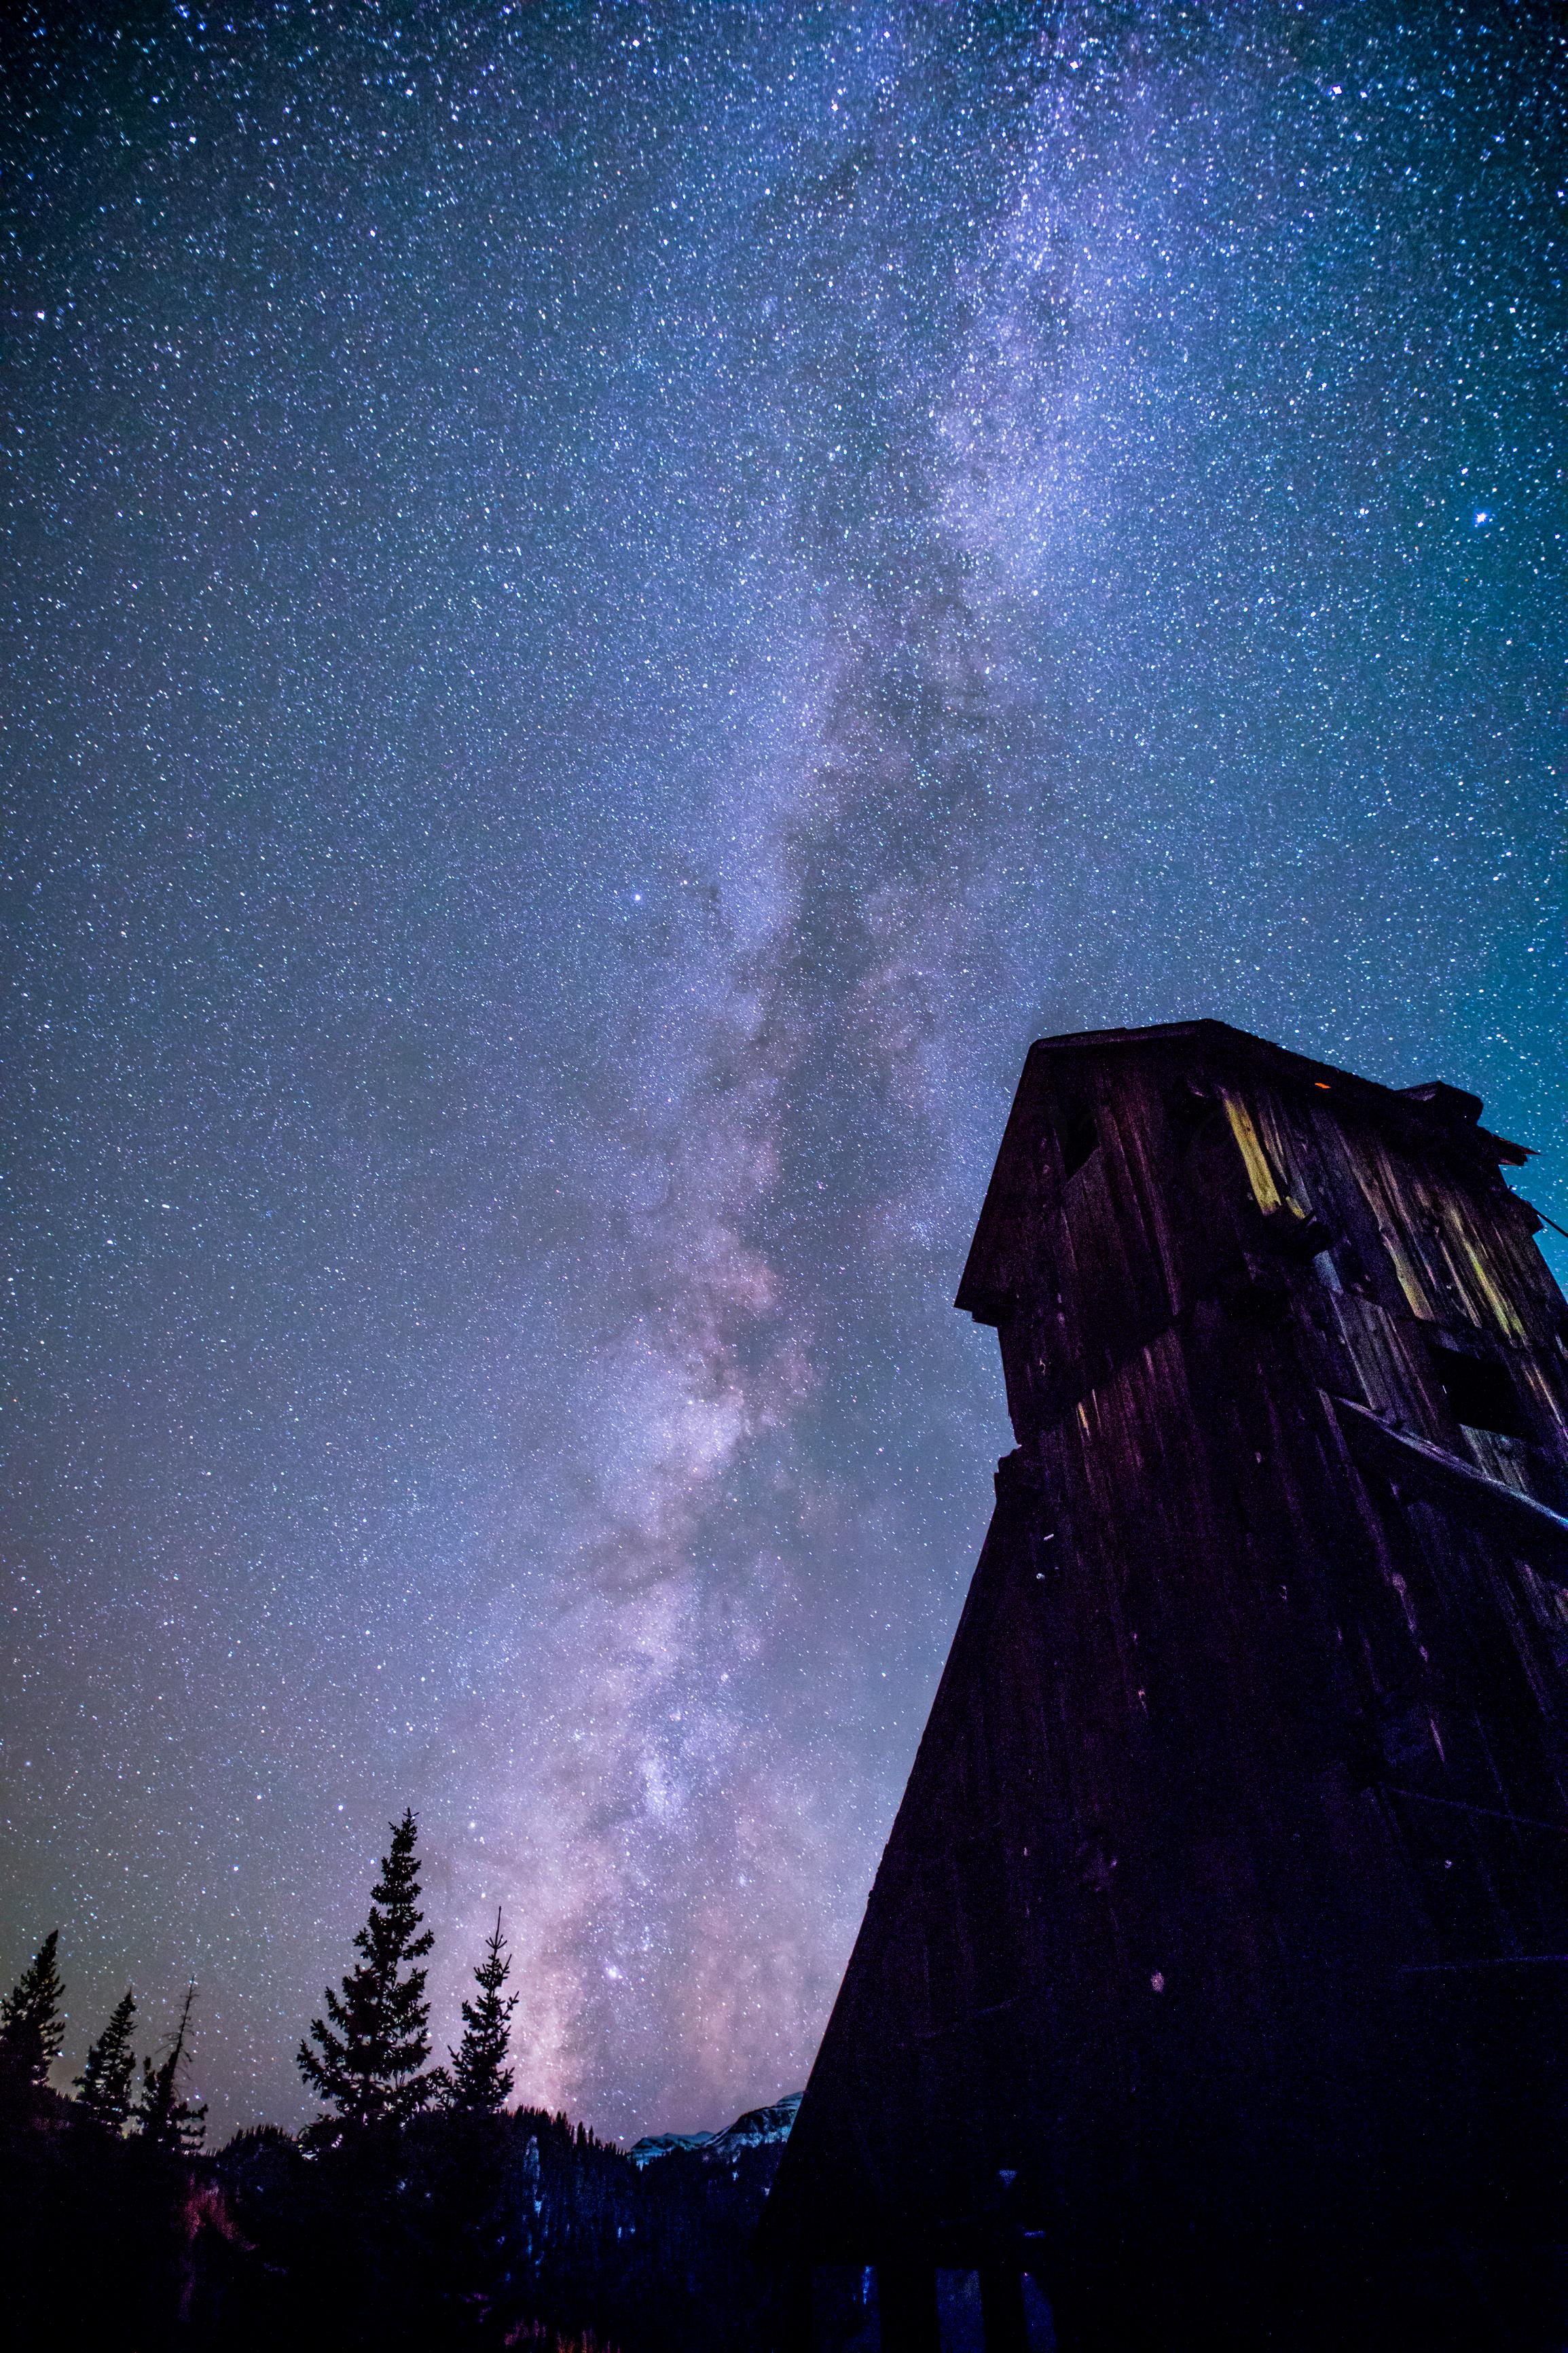 Milky way over Yankee Girl Mine, Image # 5570